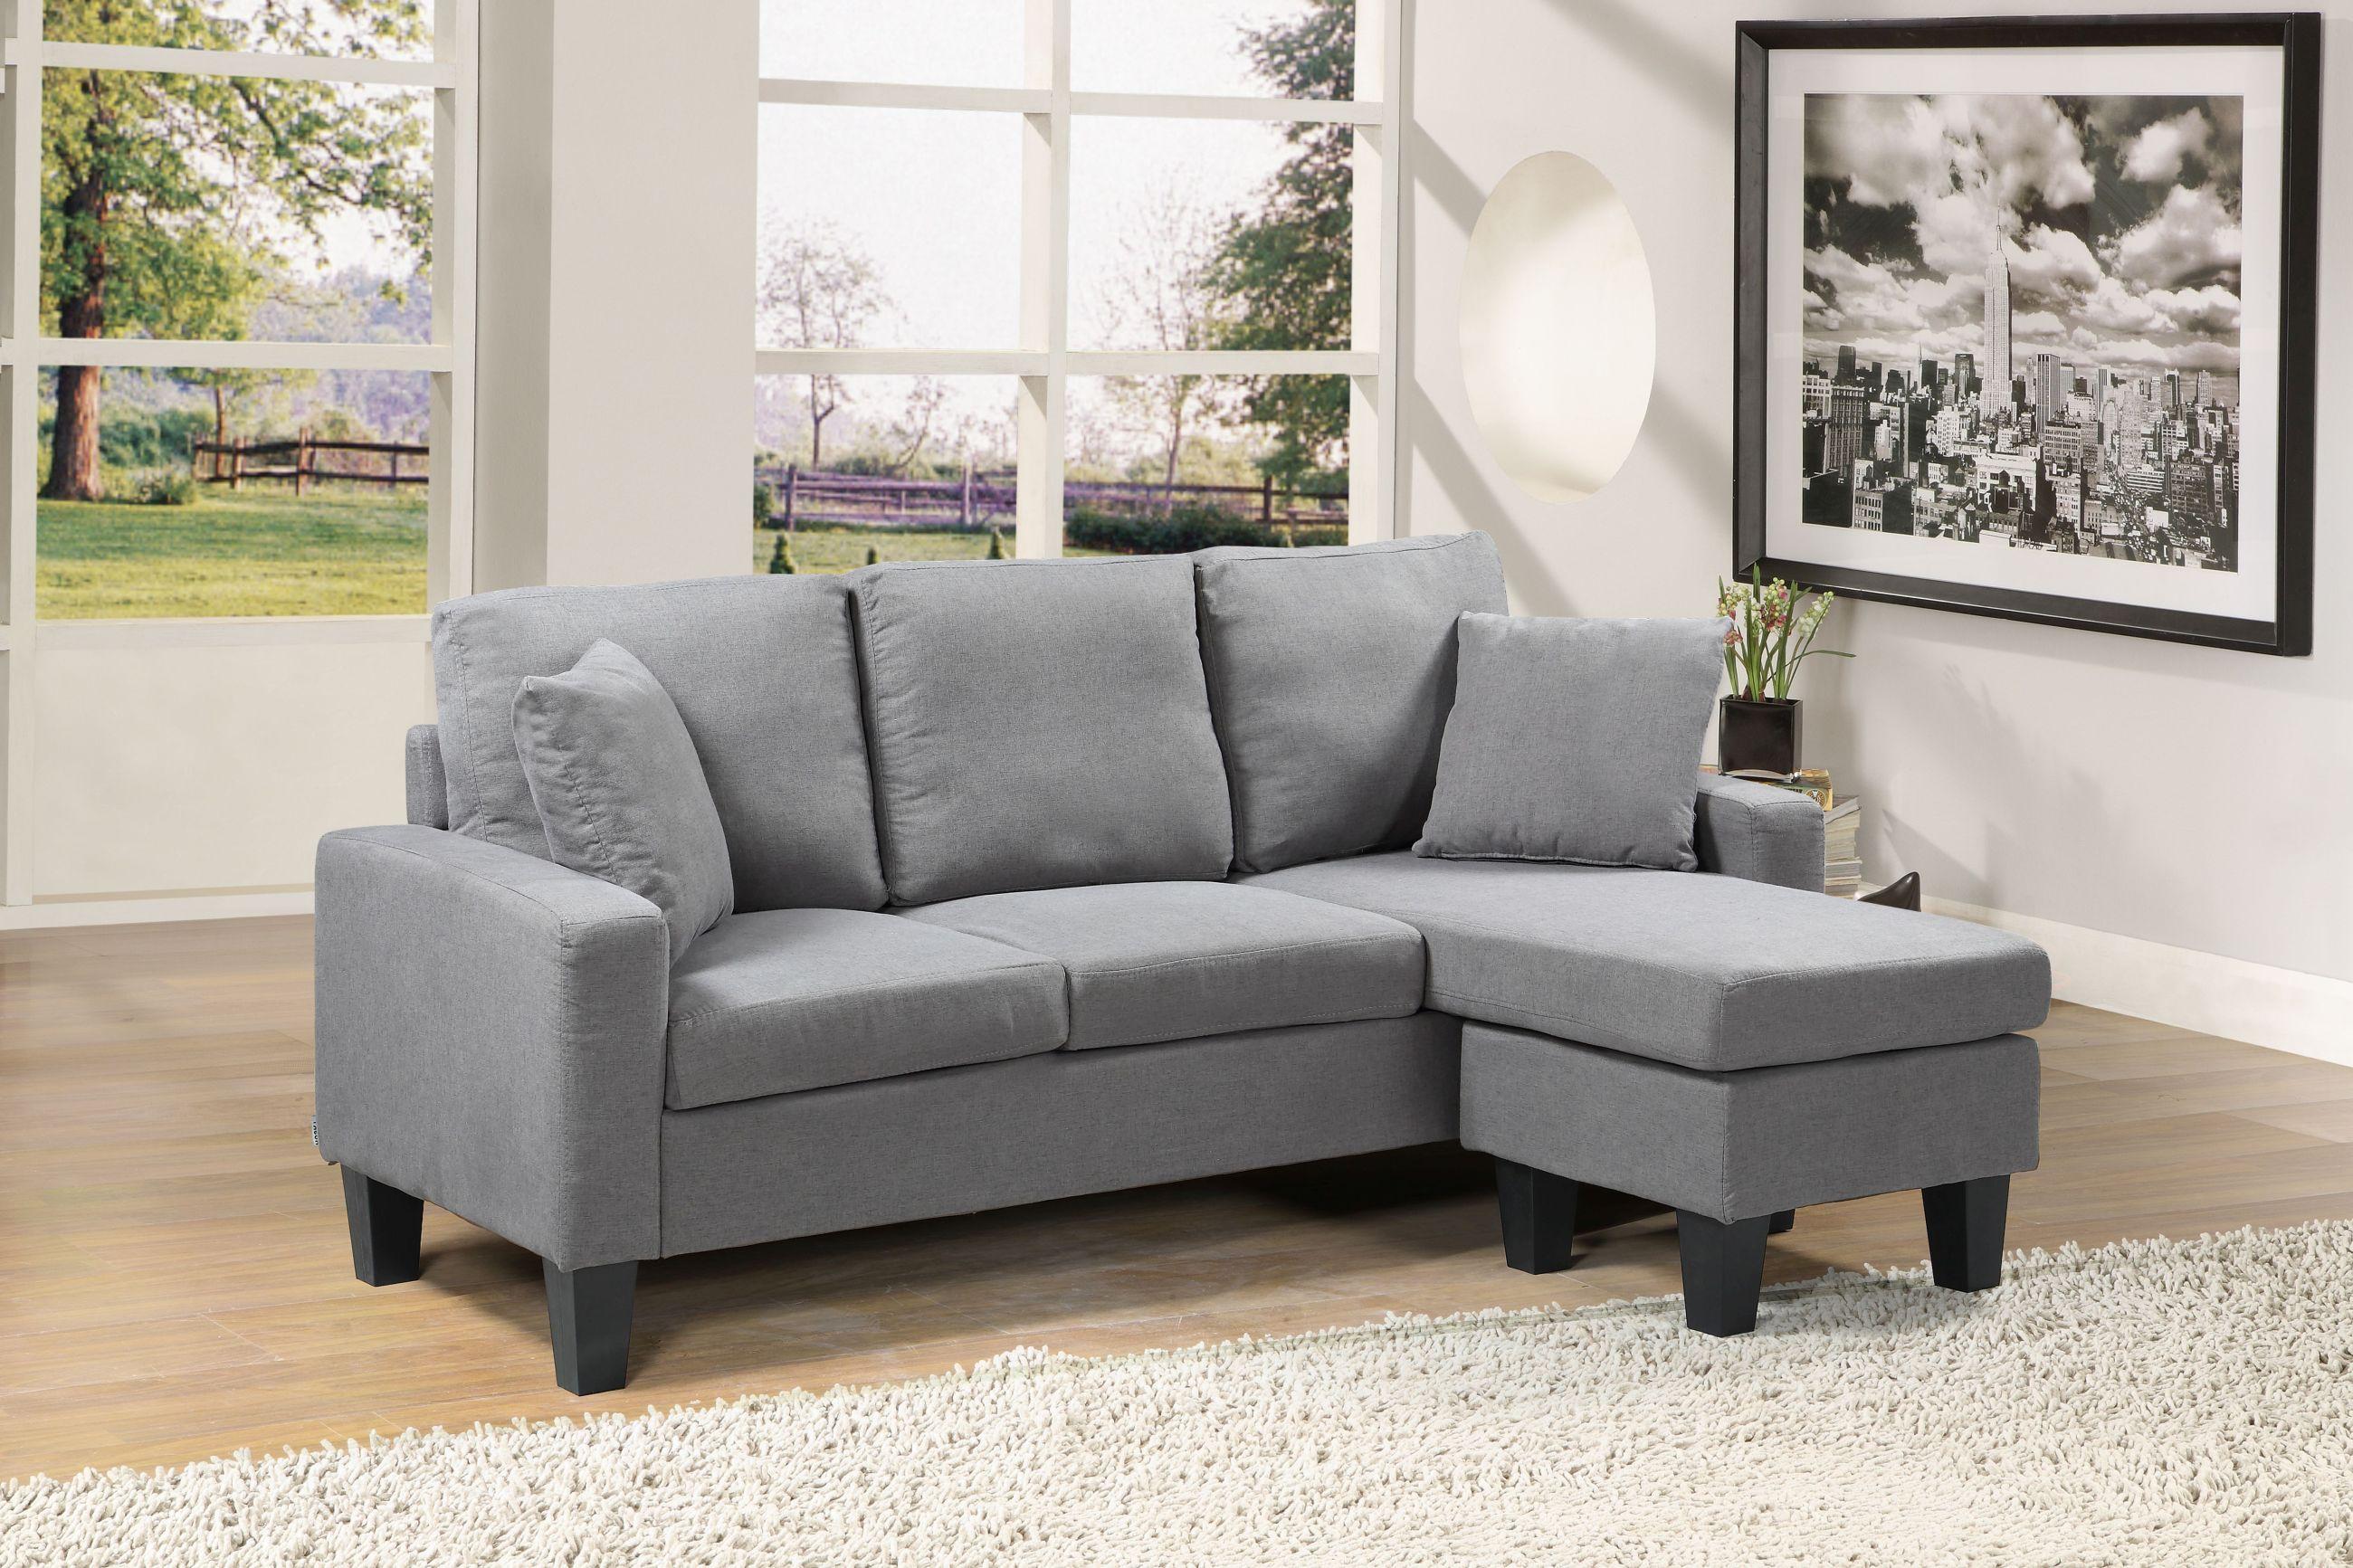 Bella Reversible Sectional Sofa Charcoal Husky 174 Furniture